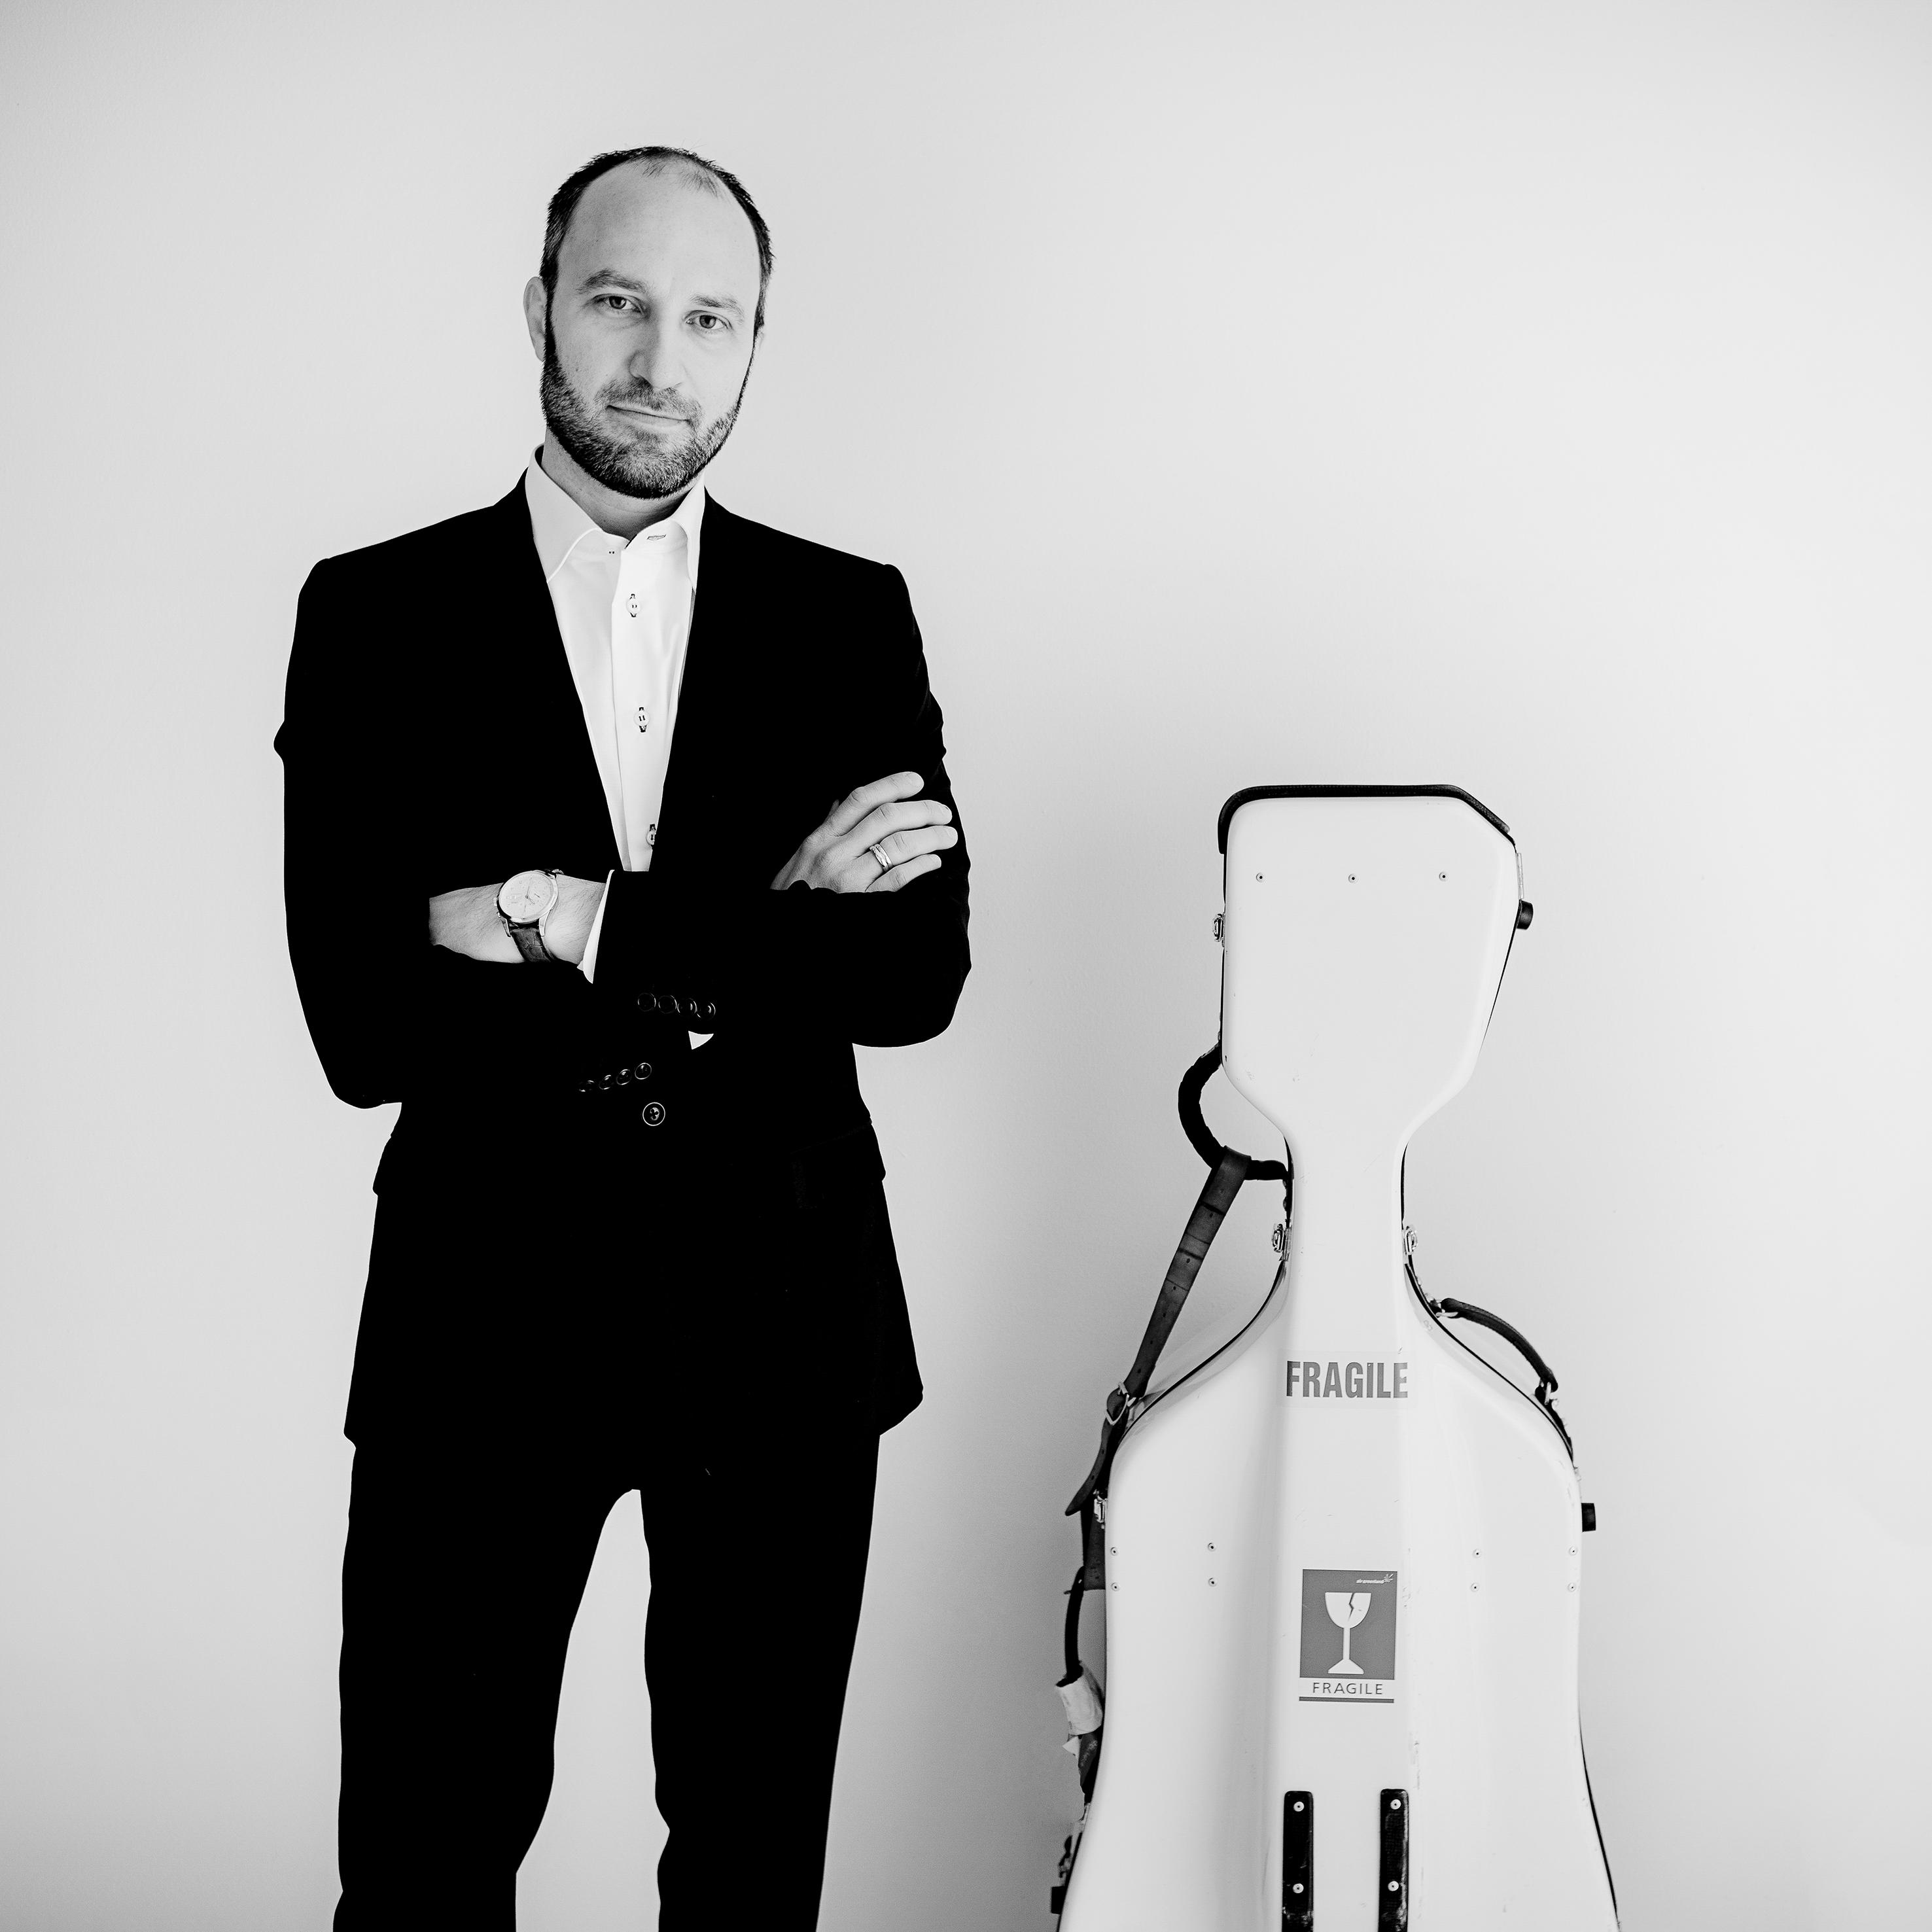 Tobias van der Pals